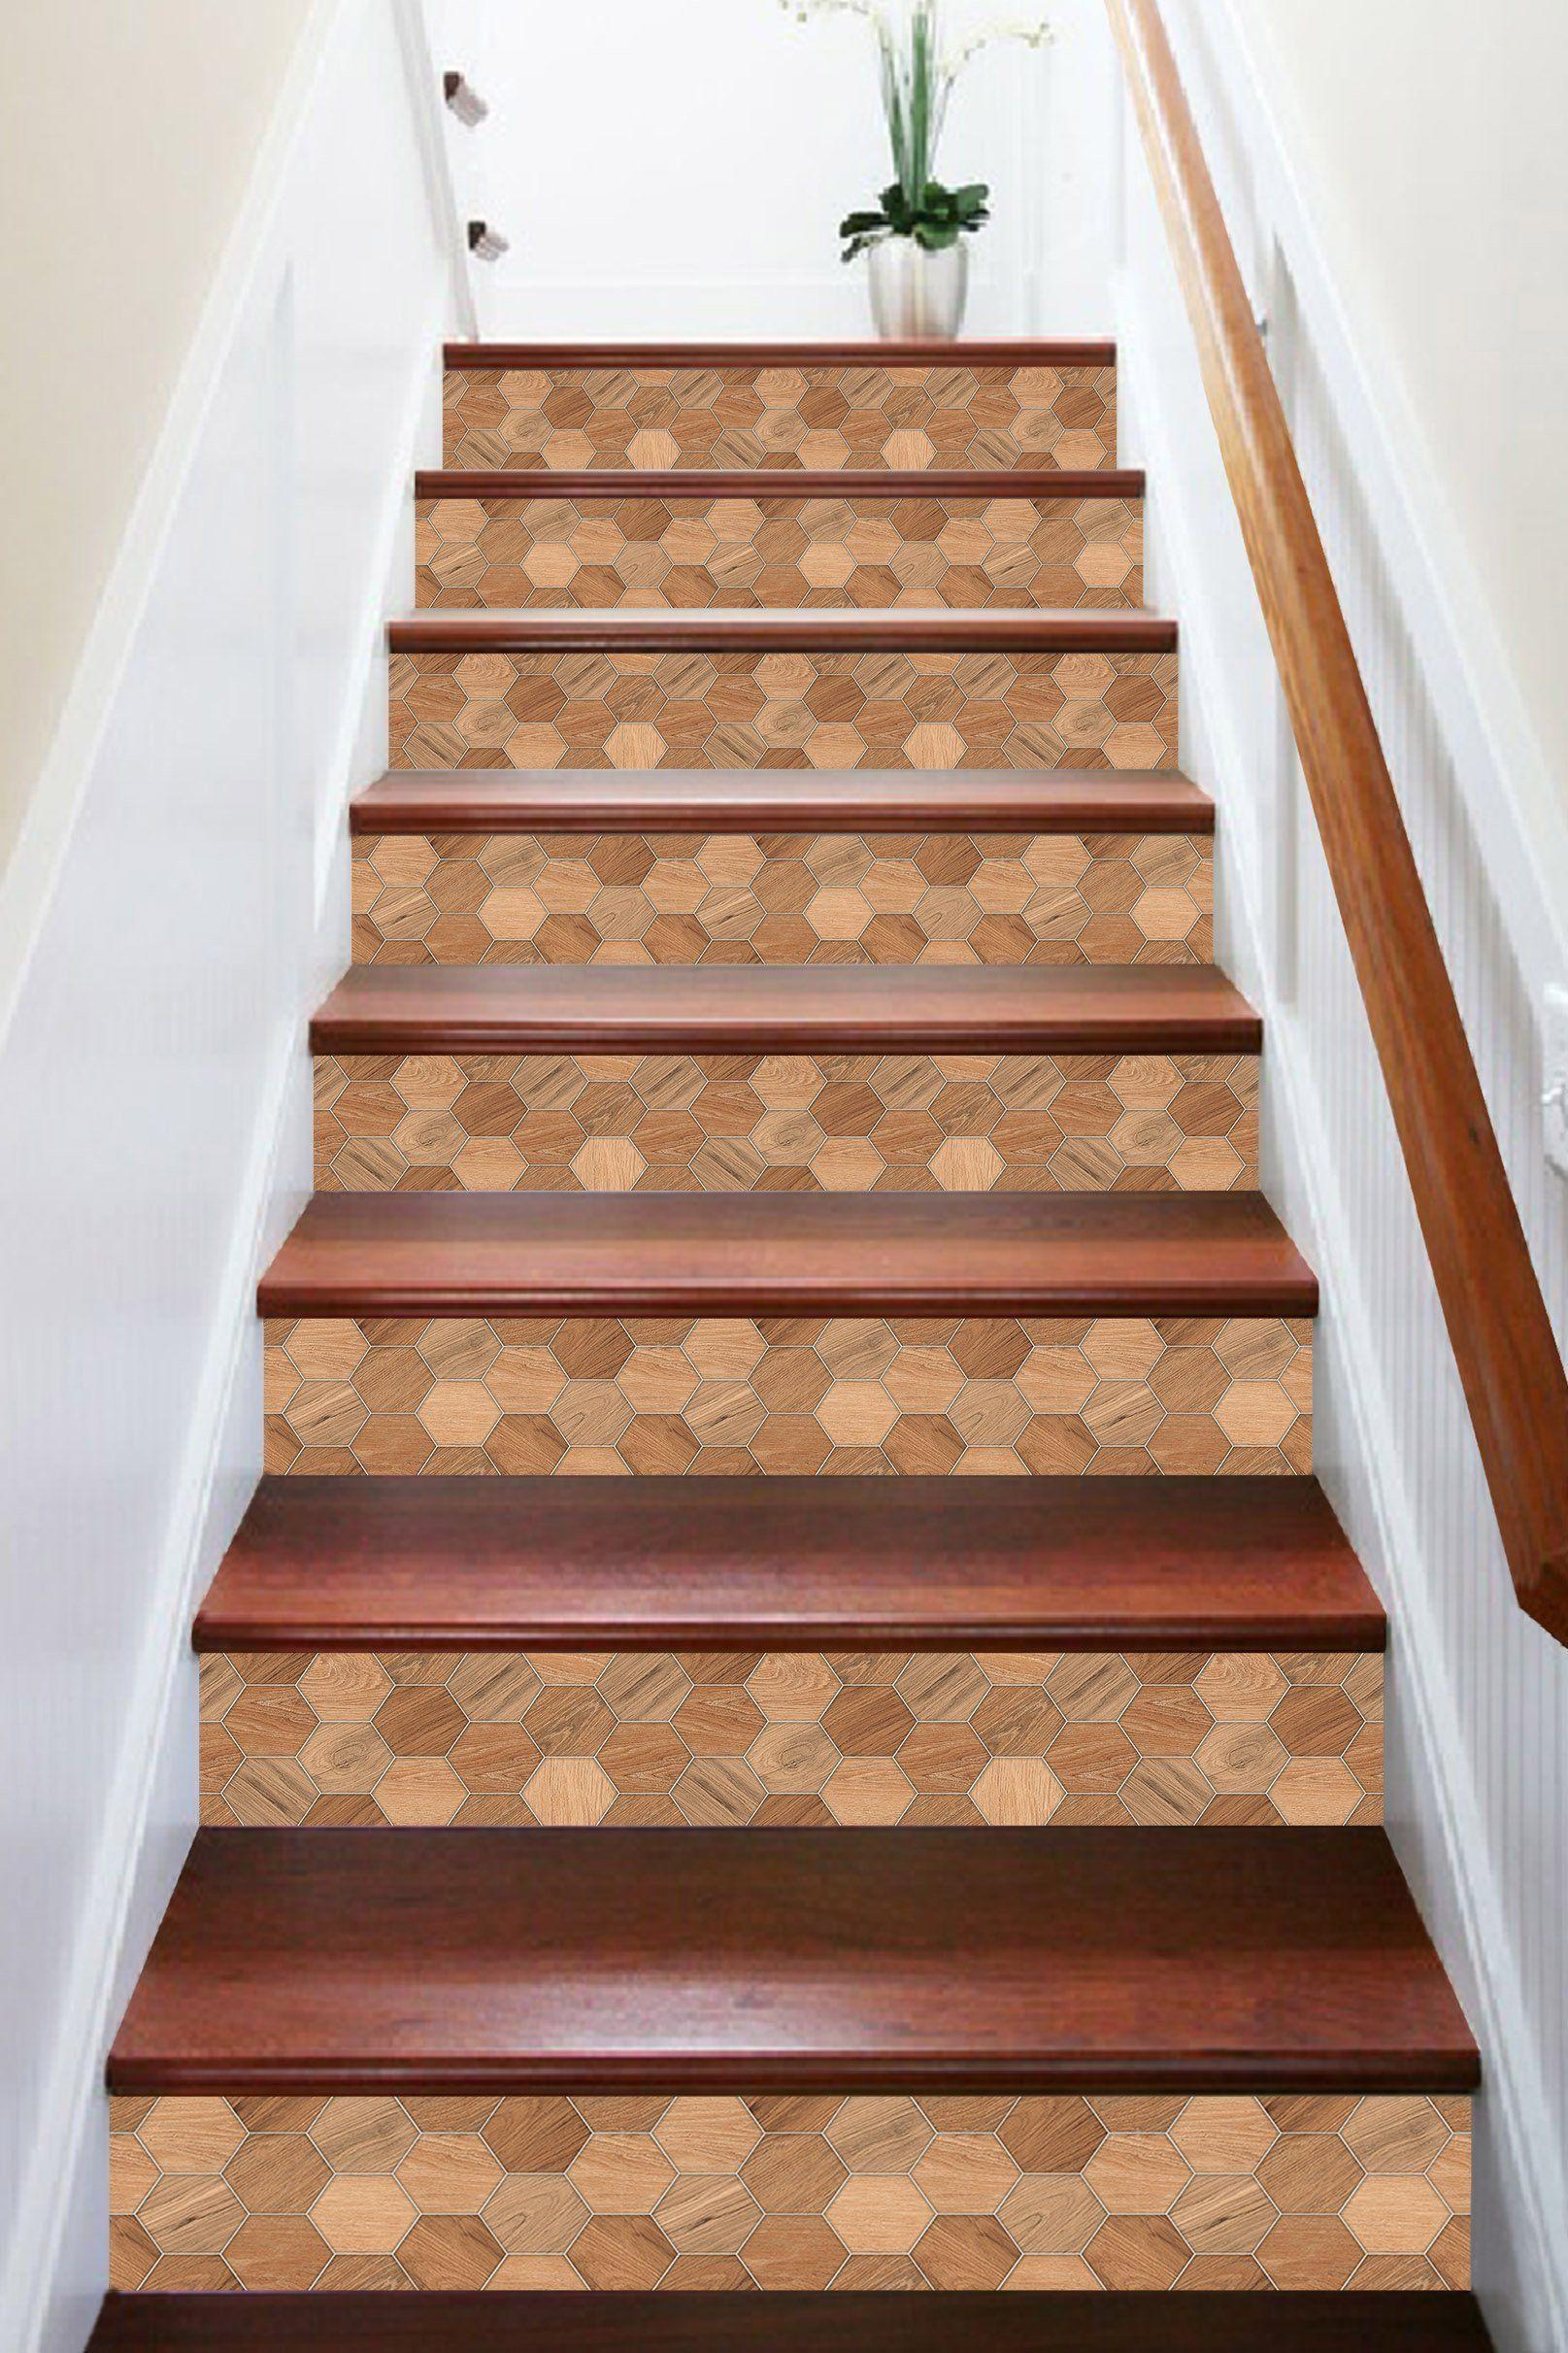 Best 3D Honeycomb Wood Grain 884 Marble Tile Texture Stair 400 x 300